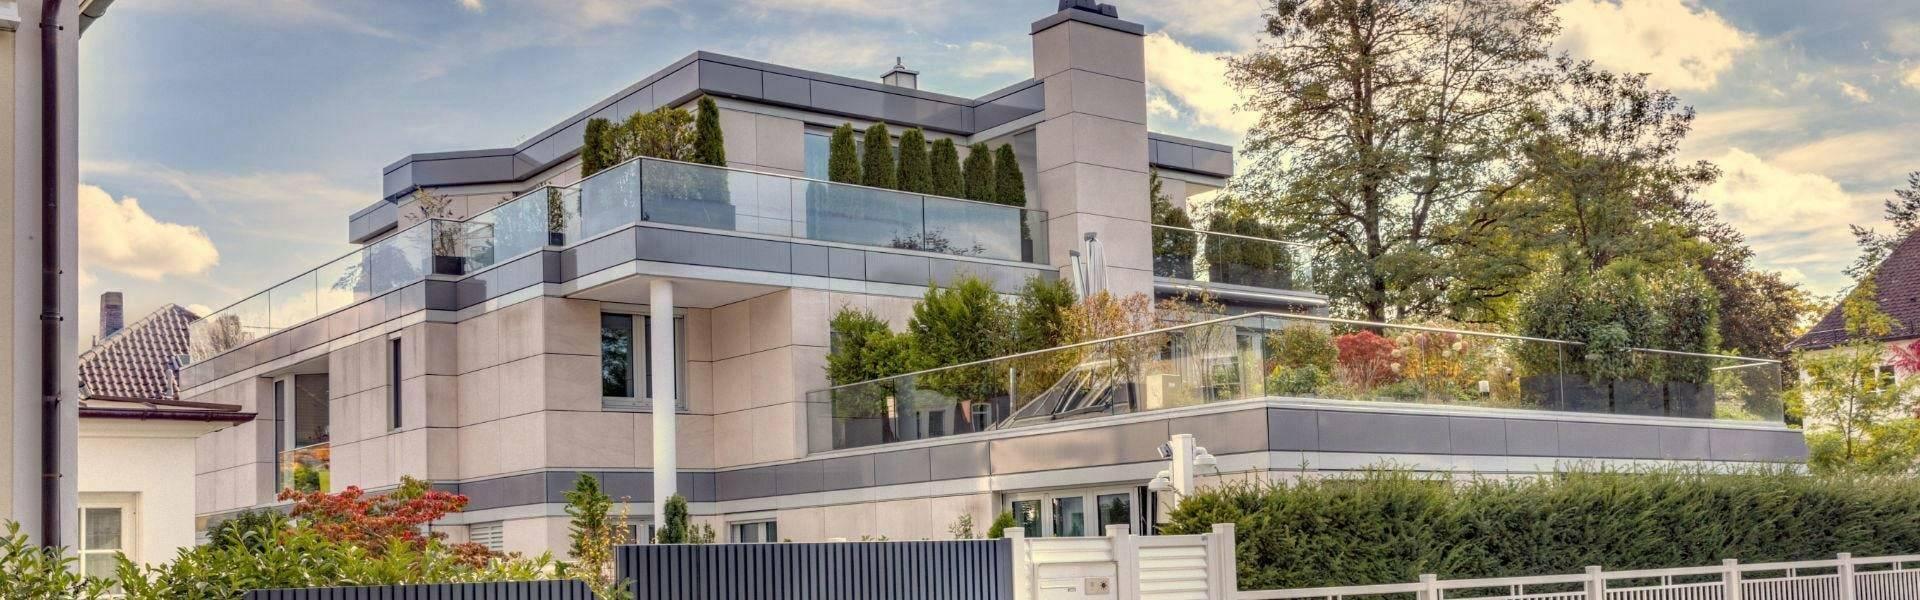 Immobilienmakler Bewertung